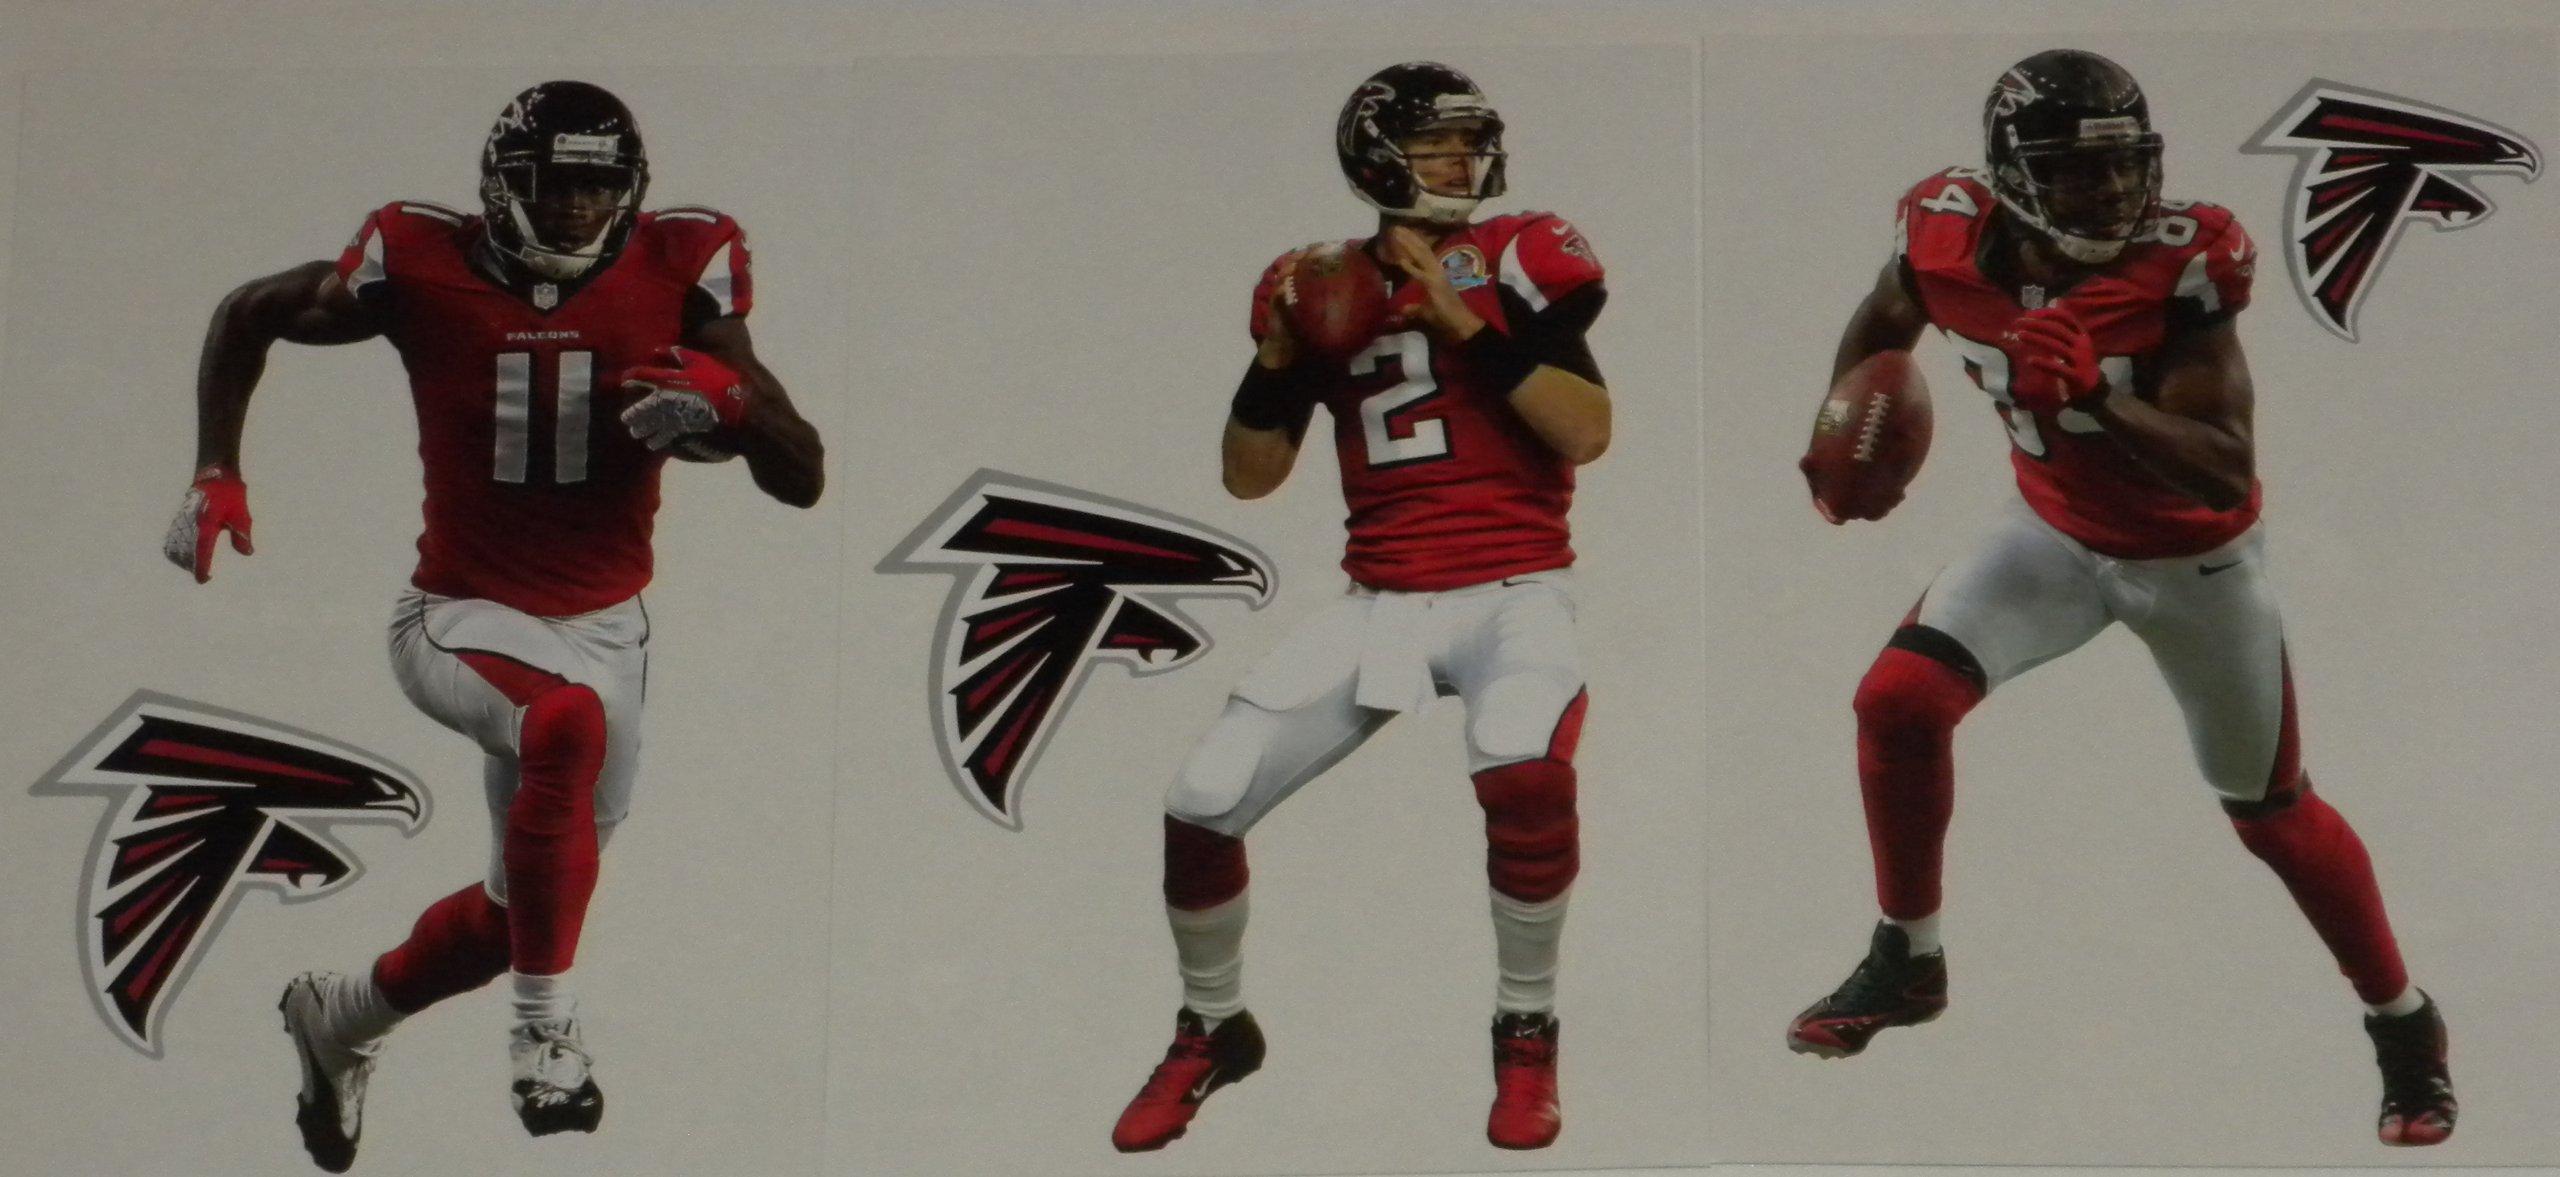 "Atlanta Falcons Mini FATHEAD Team Set of 6 Official Vinyl Wall Graphics (3 Players + 3 Falcons Logo) Each Player Graphic 7"" INCH"